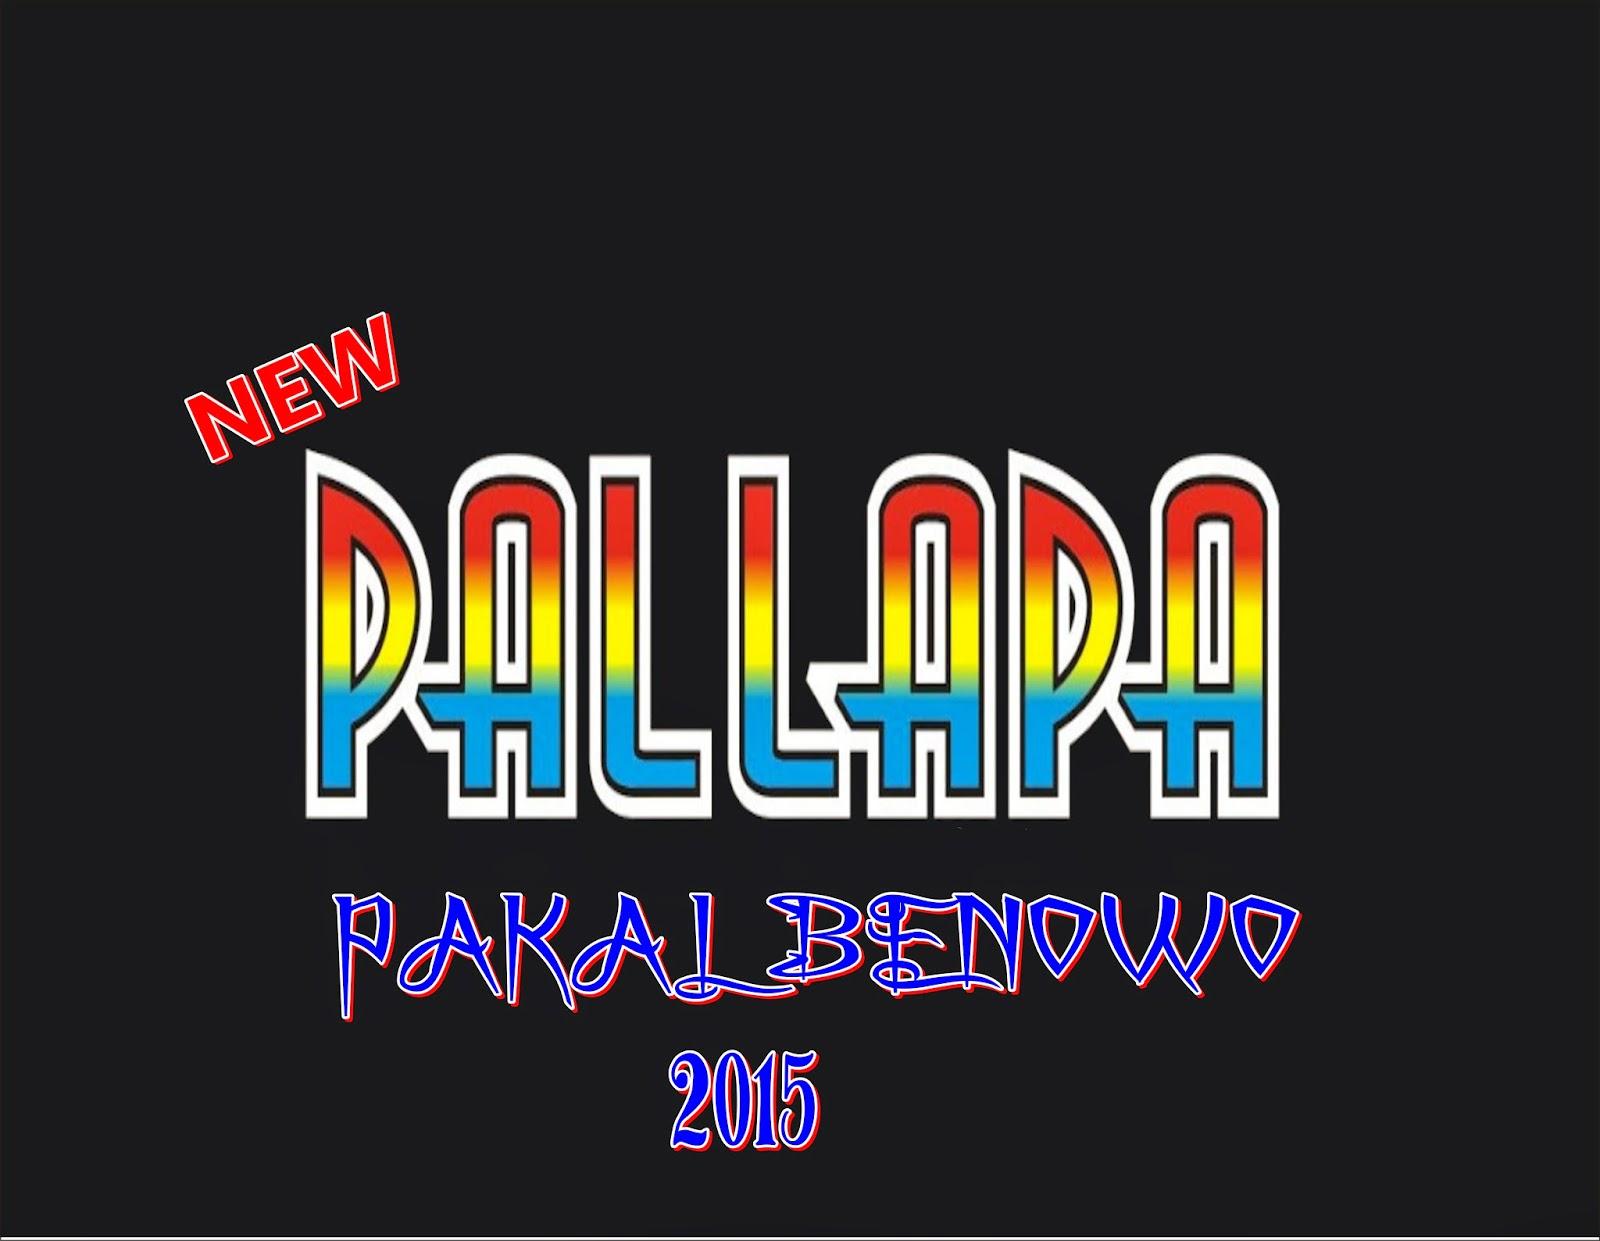 NEW PALLAPA LIVE PAKAL BENOWO 2015 | blog zombie salah ketik